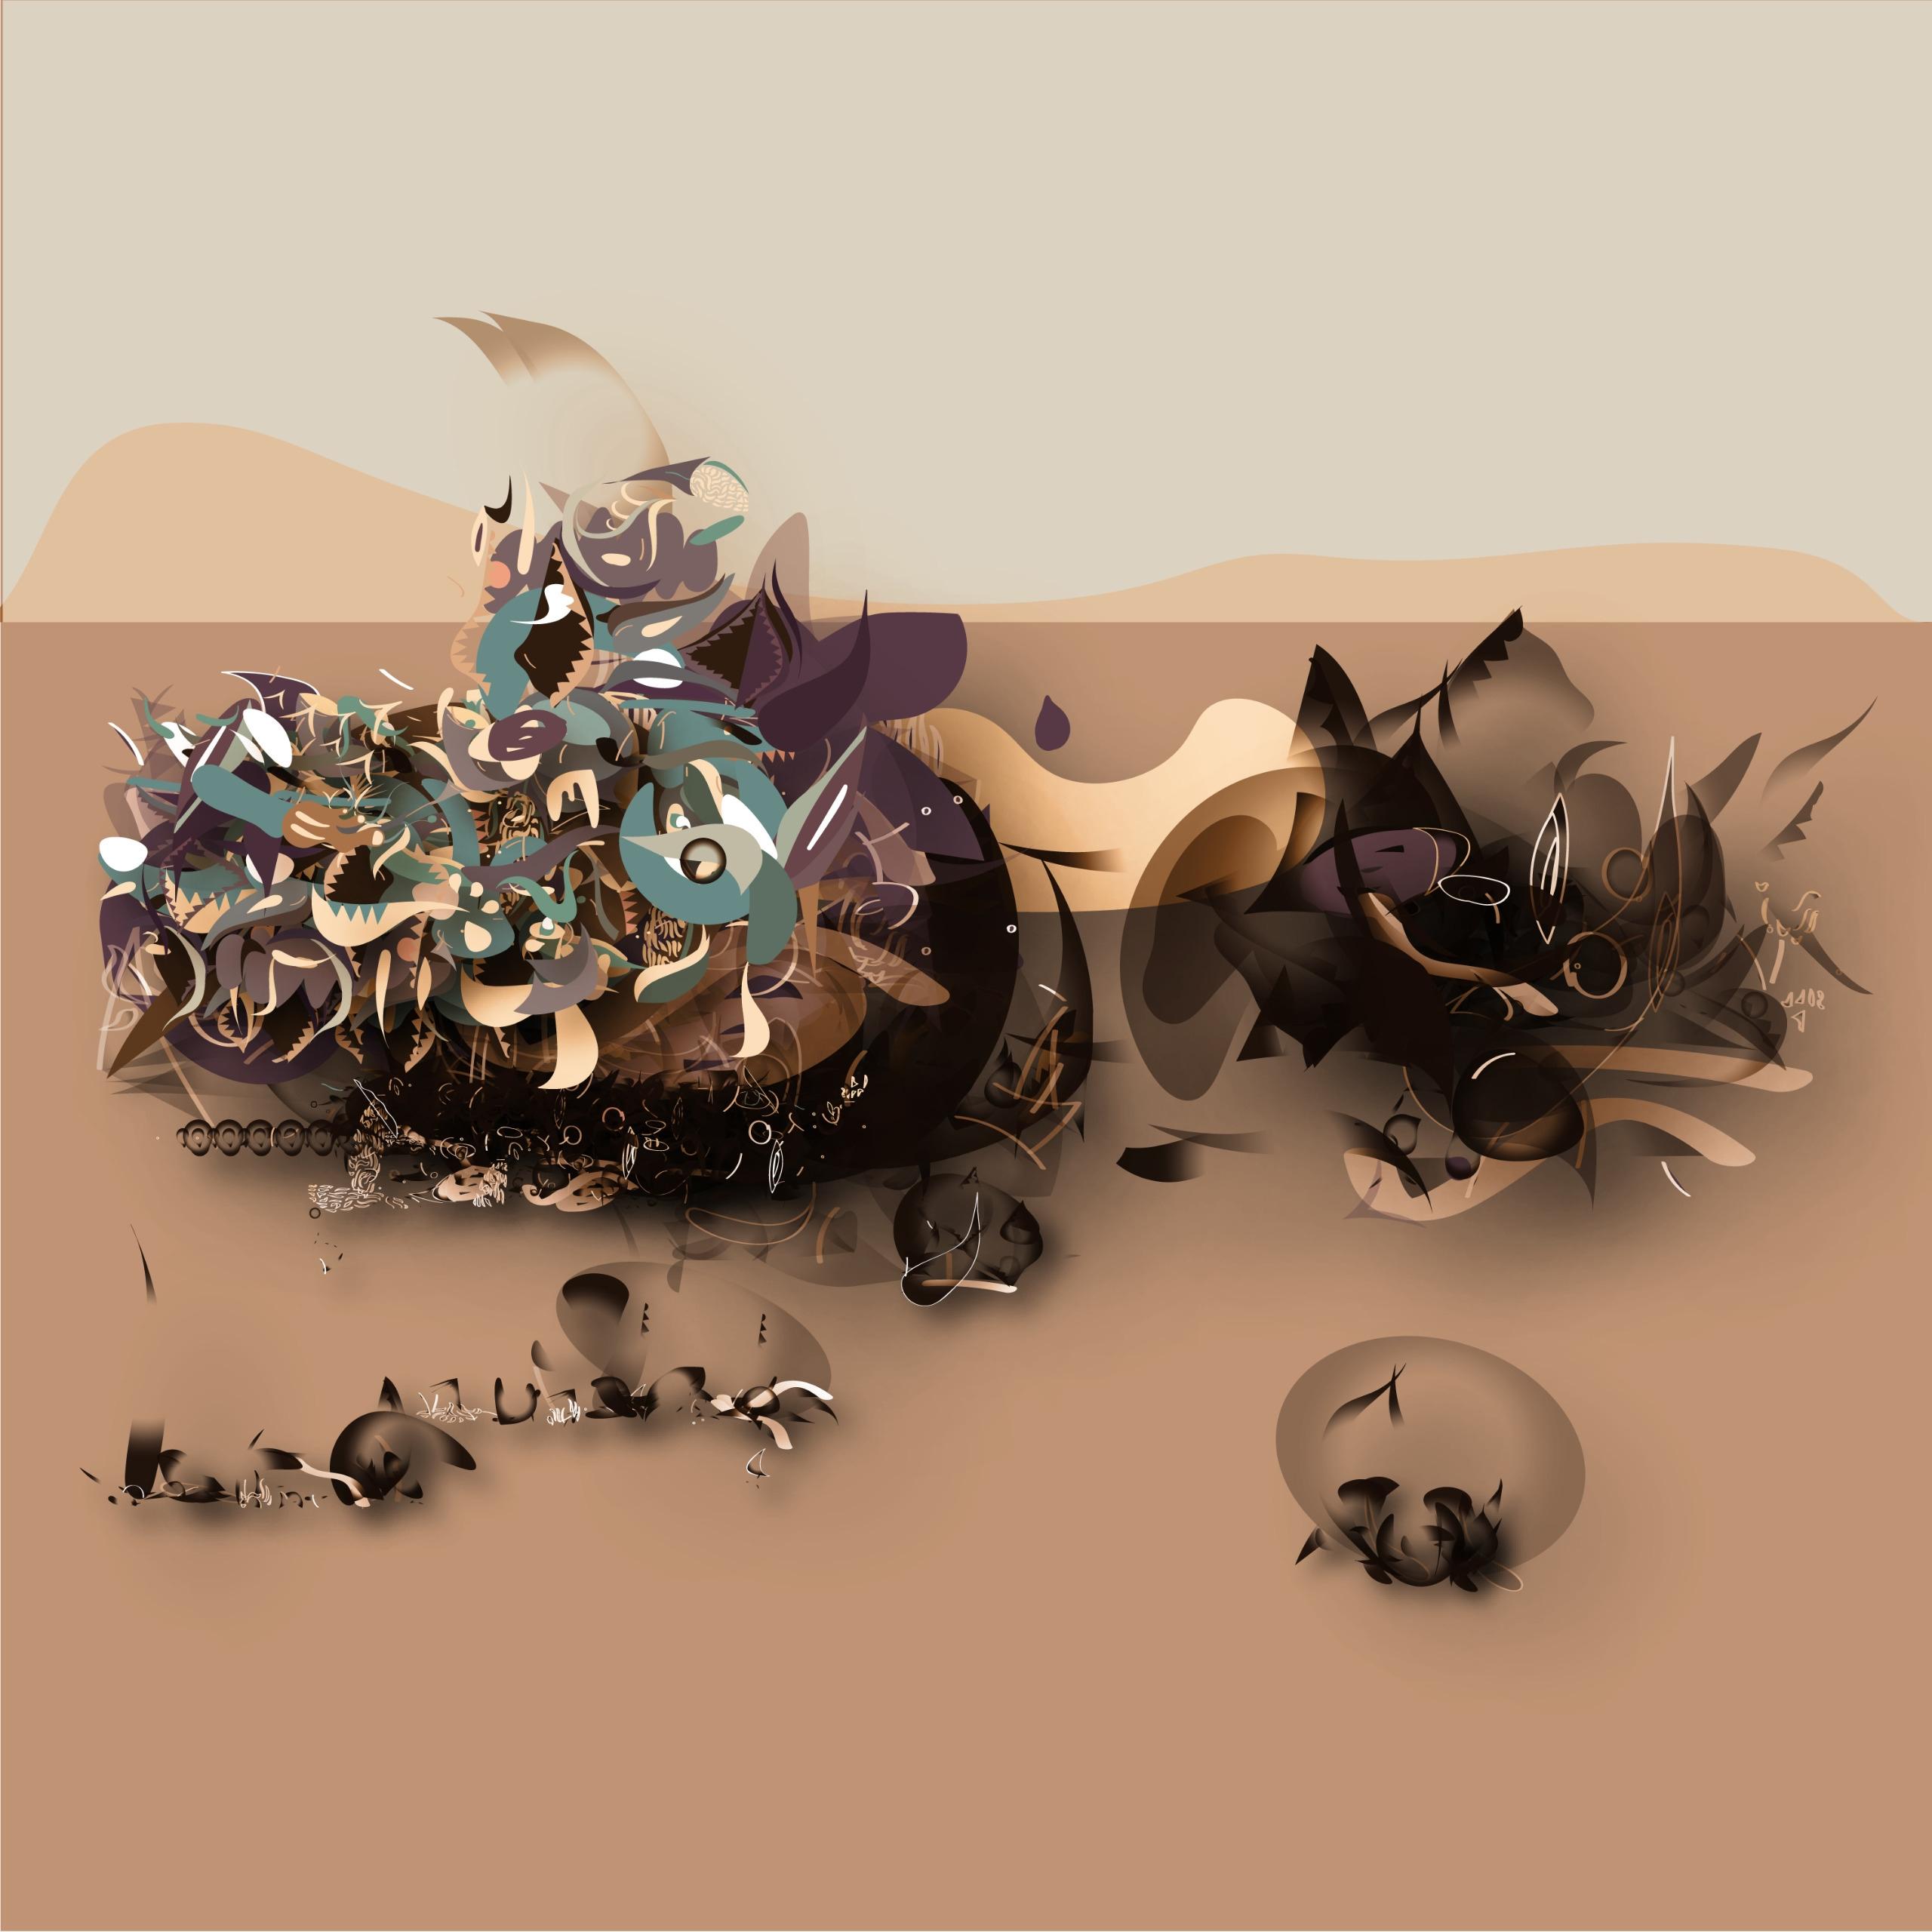 Cargo Vector Illustration -2017 - davidjoel | ello